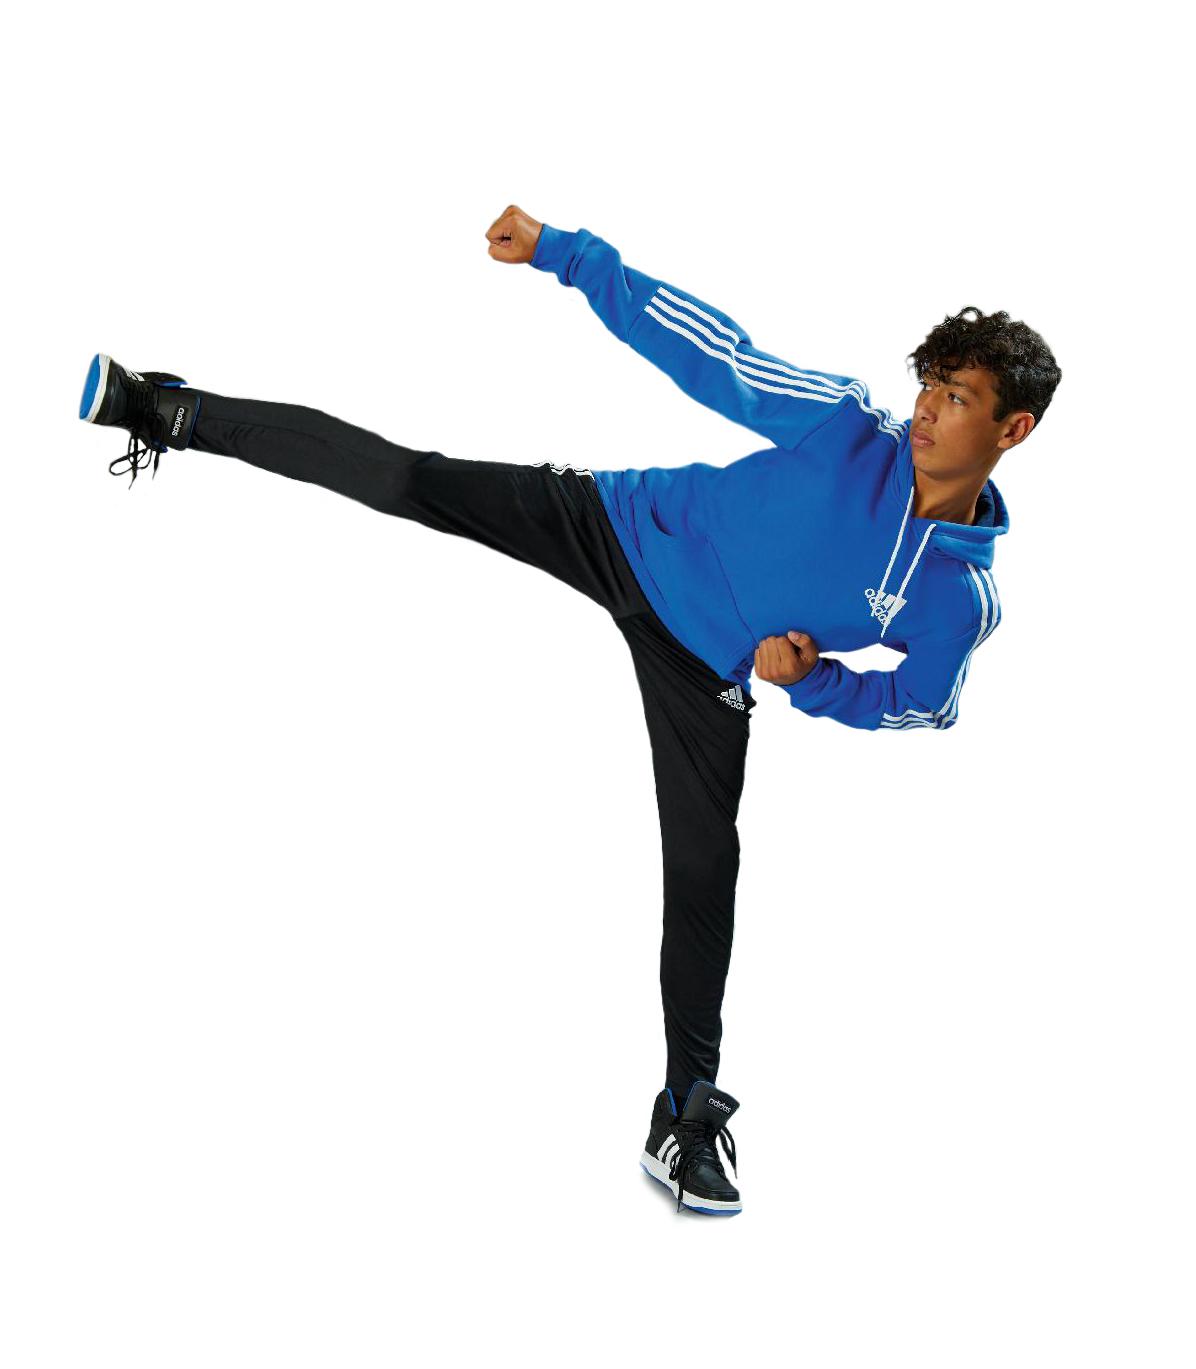 jess kickboxer.jpg